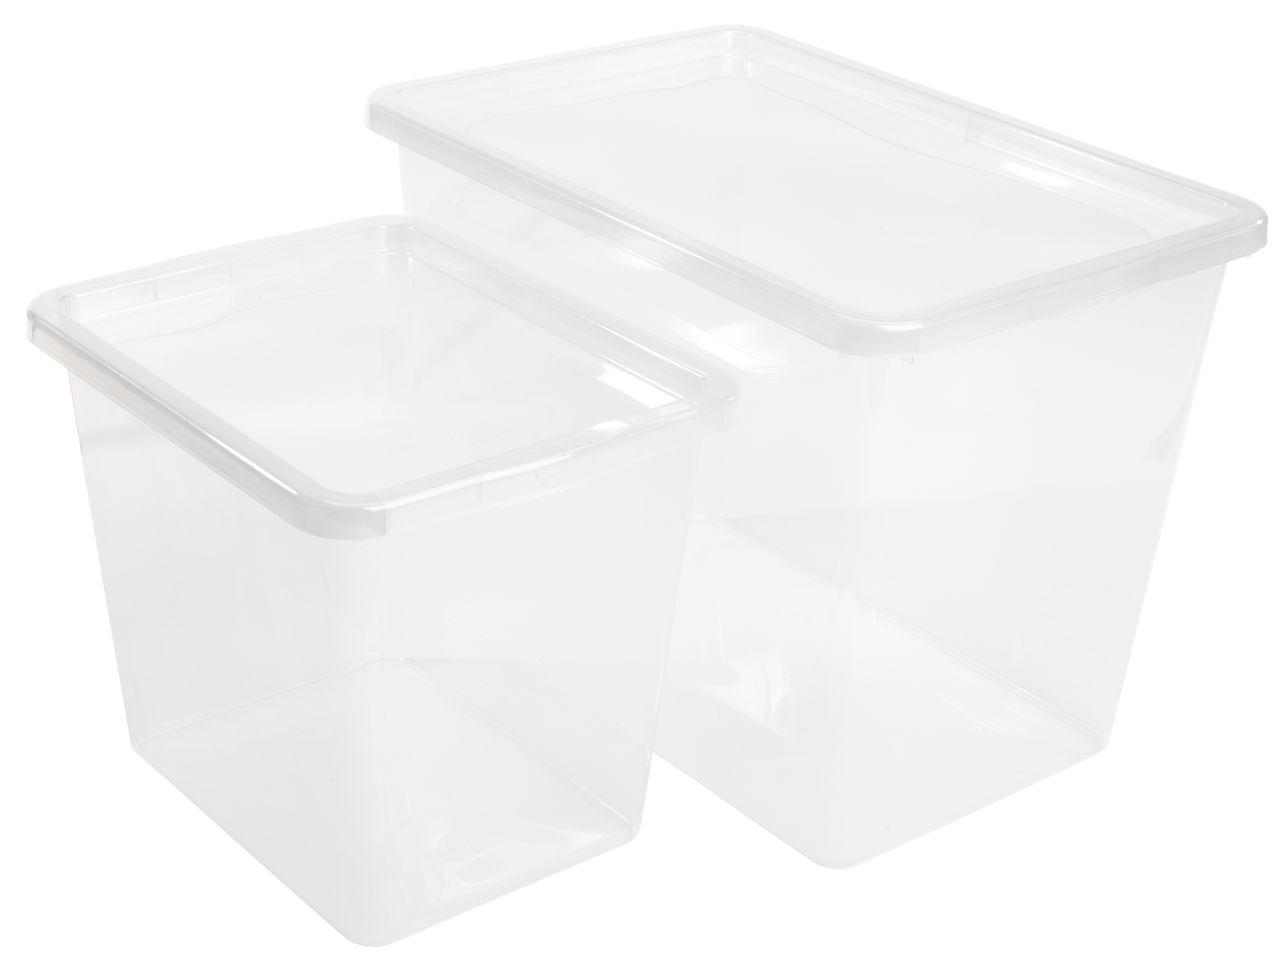 Tároló doboz BASIC BOX 80 liter tetővel f4b8b45b66